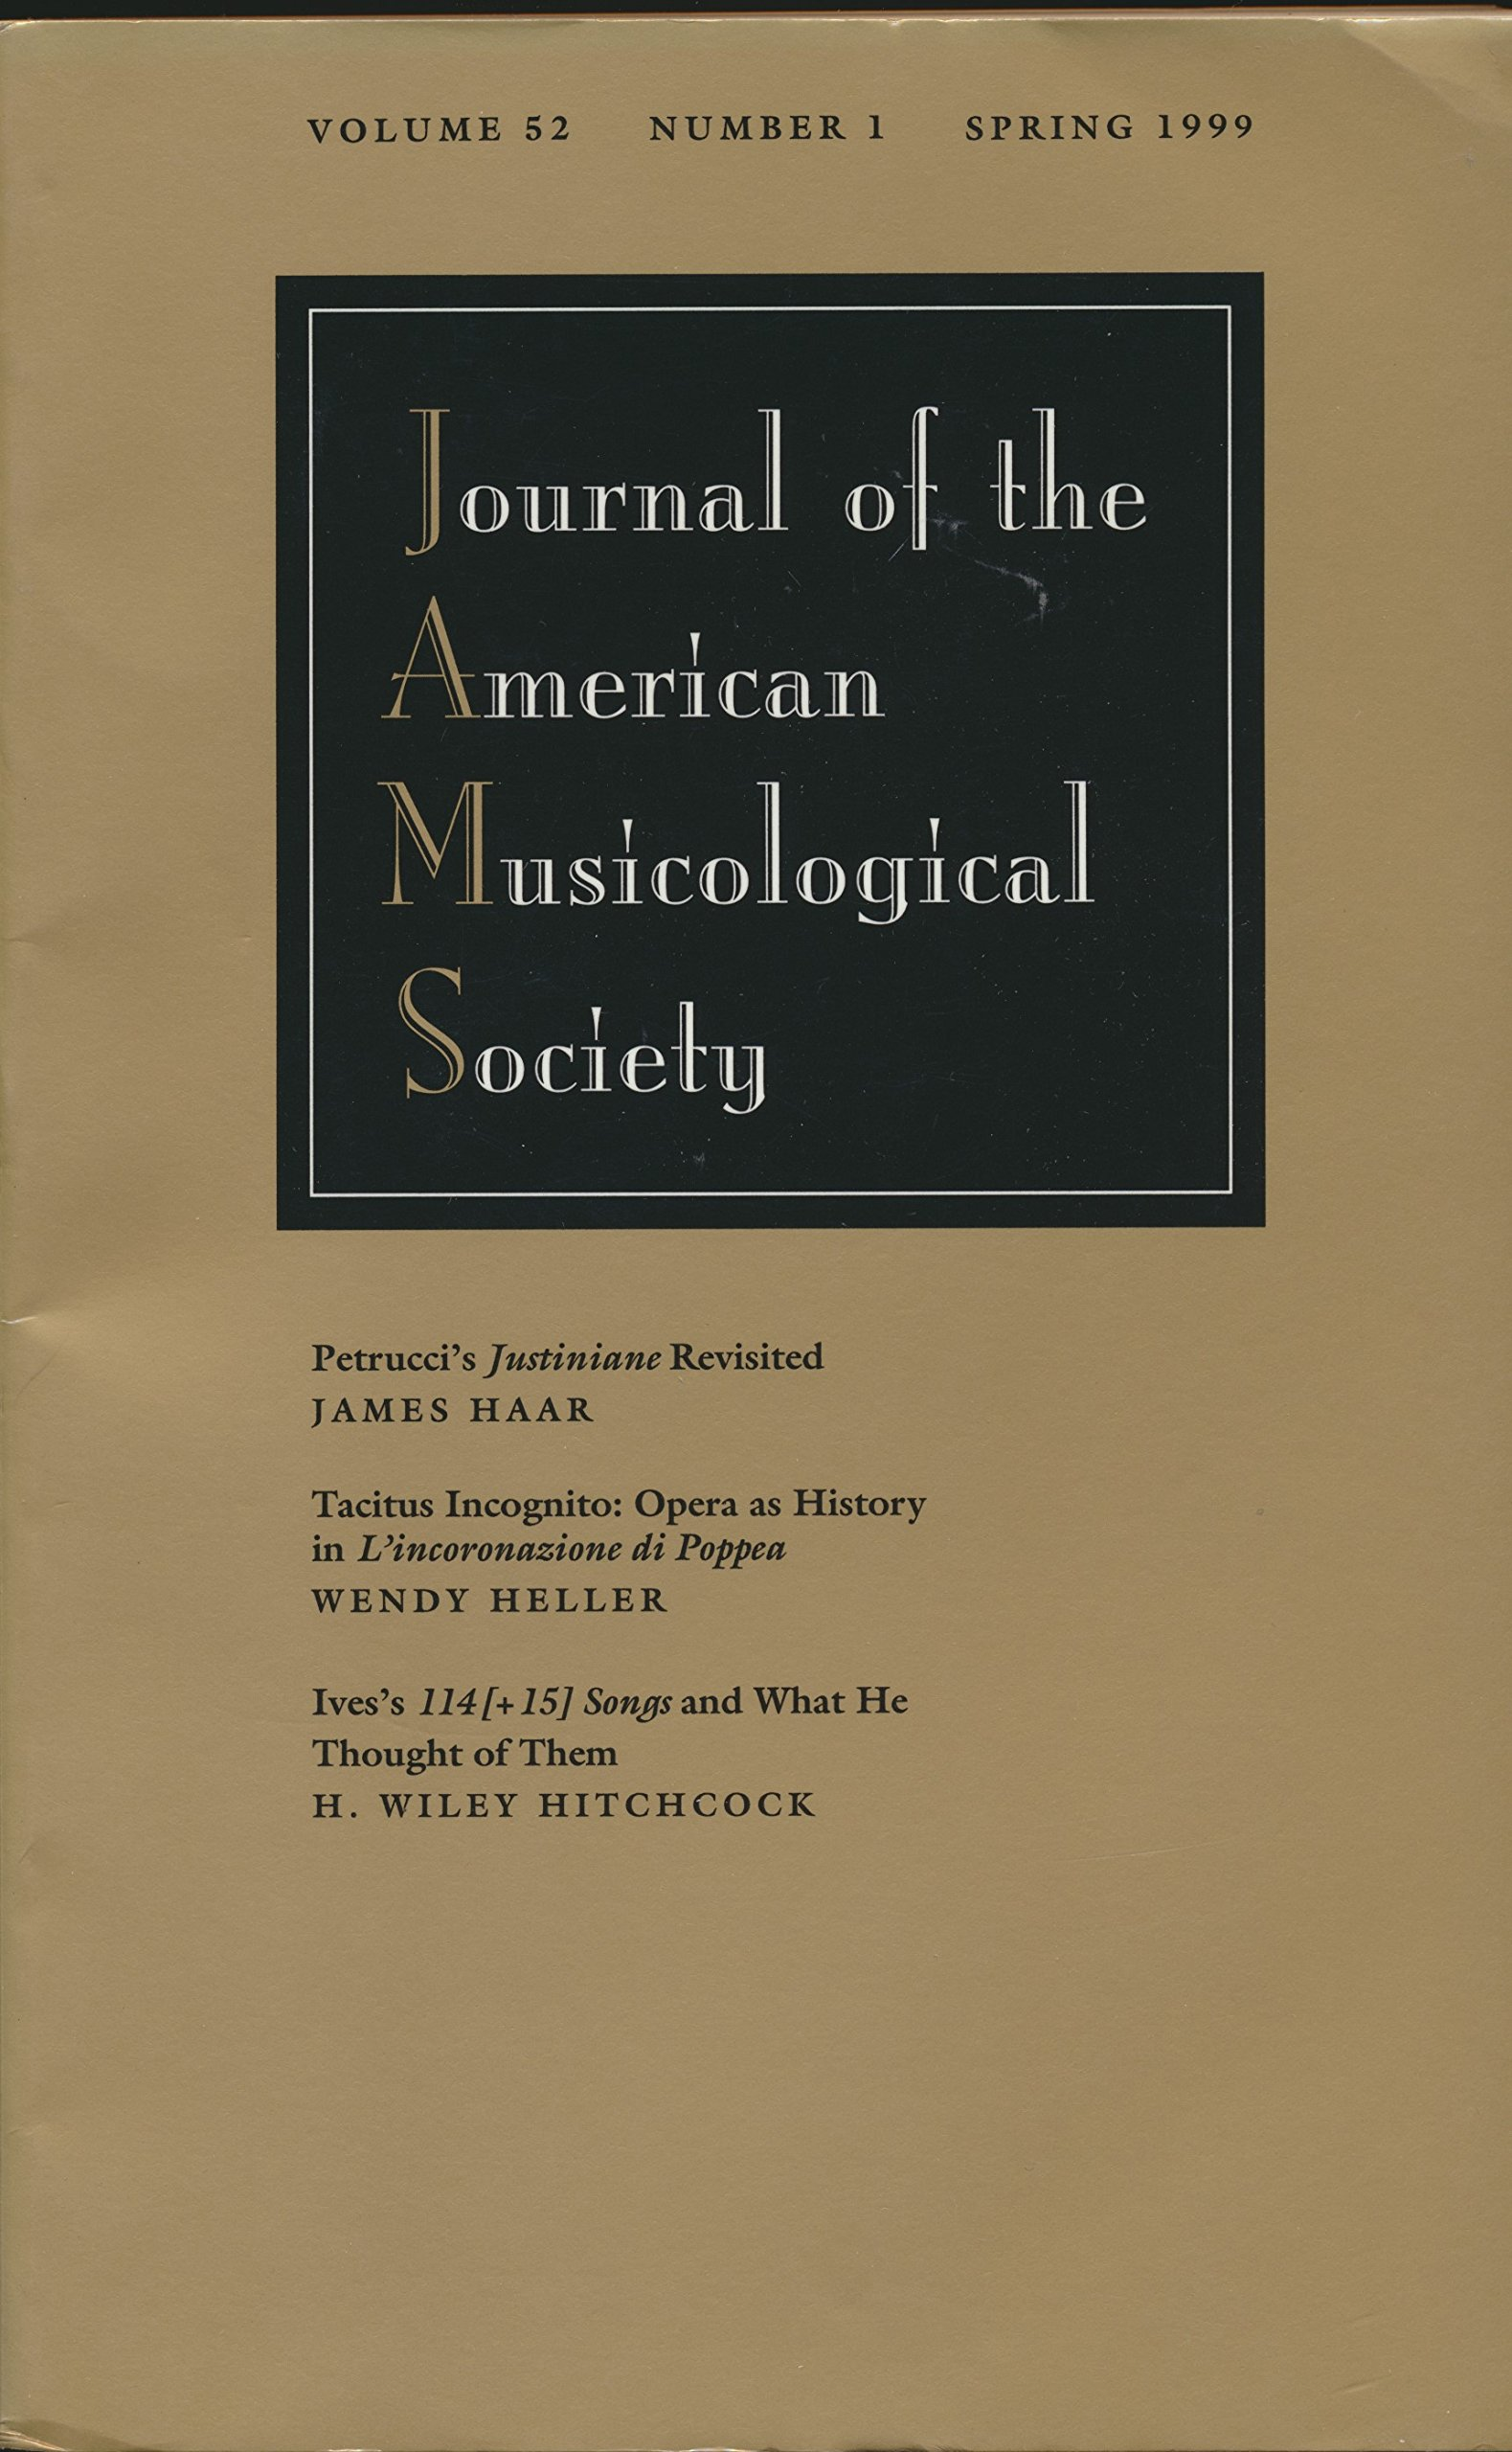 American Musicological Society: Petrucci's Justiniane